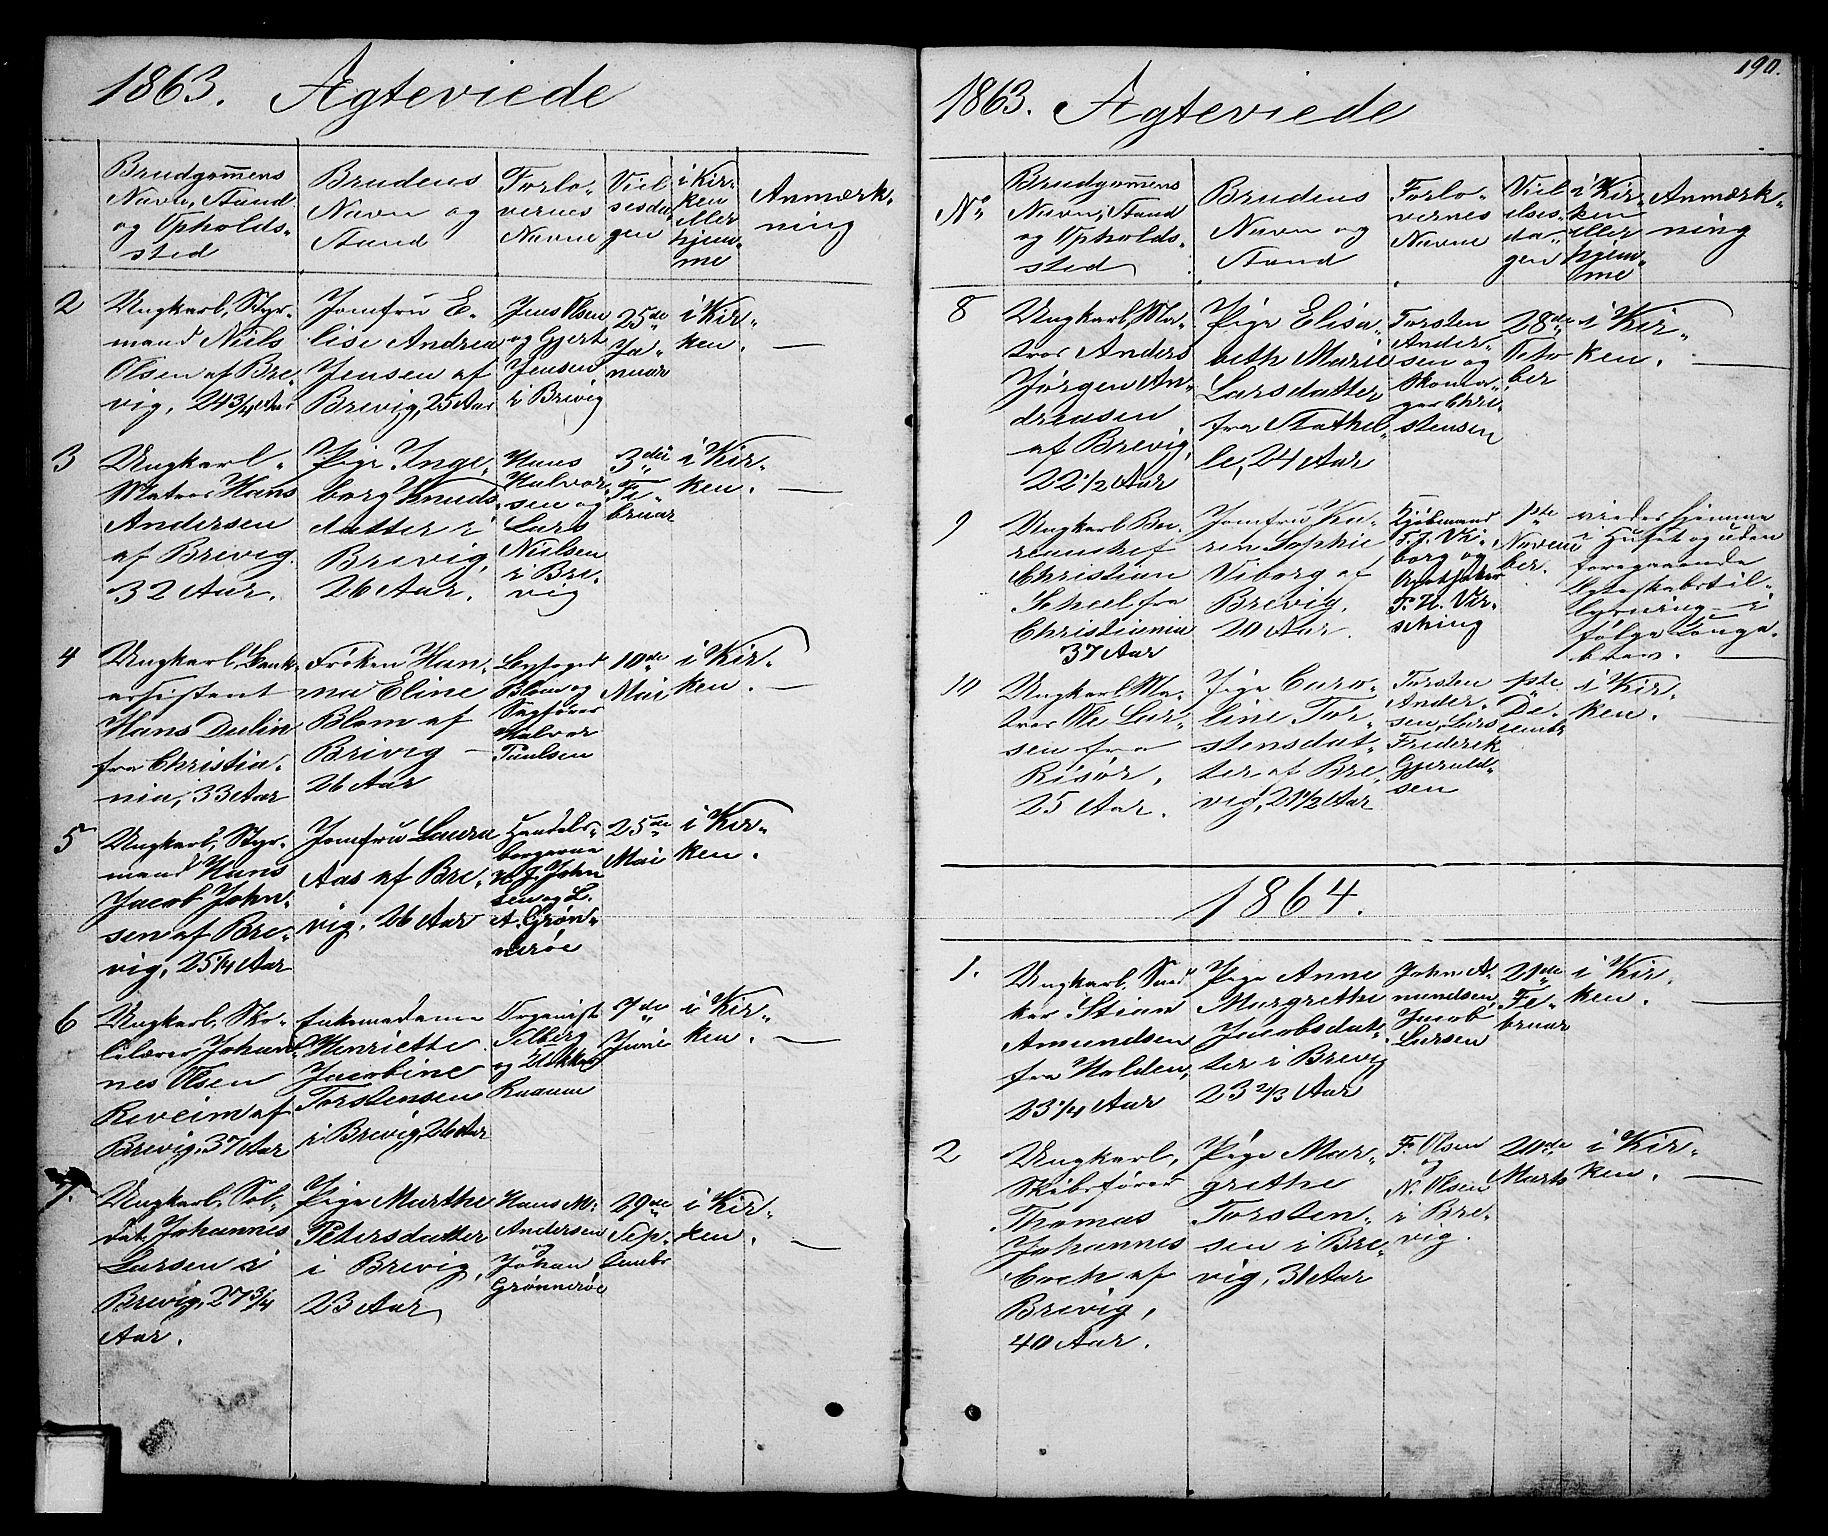 SAKO, Brevik kirkebøker, G/Ga/L0002: Klokkerbok nr. 2, 1846-1865, s. 190